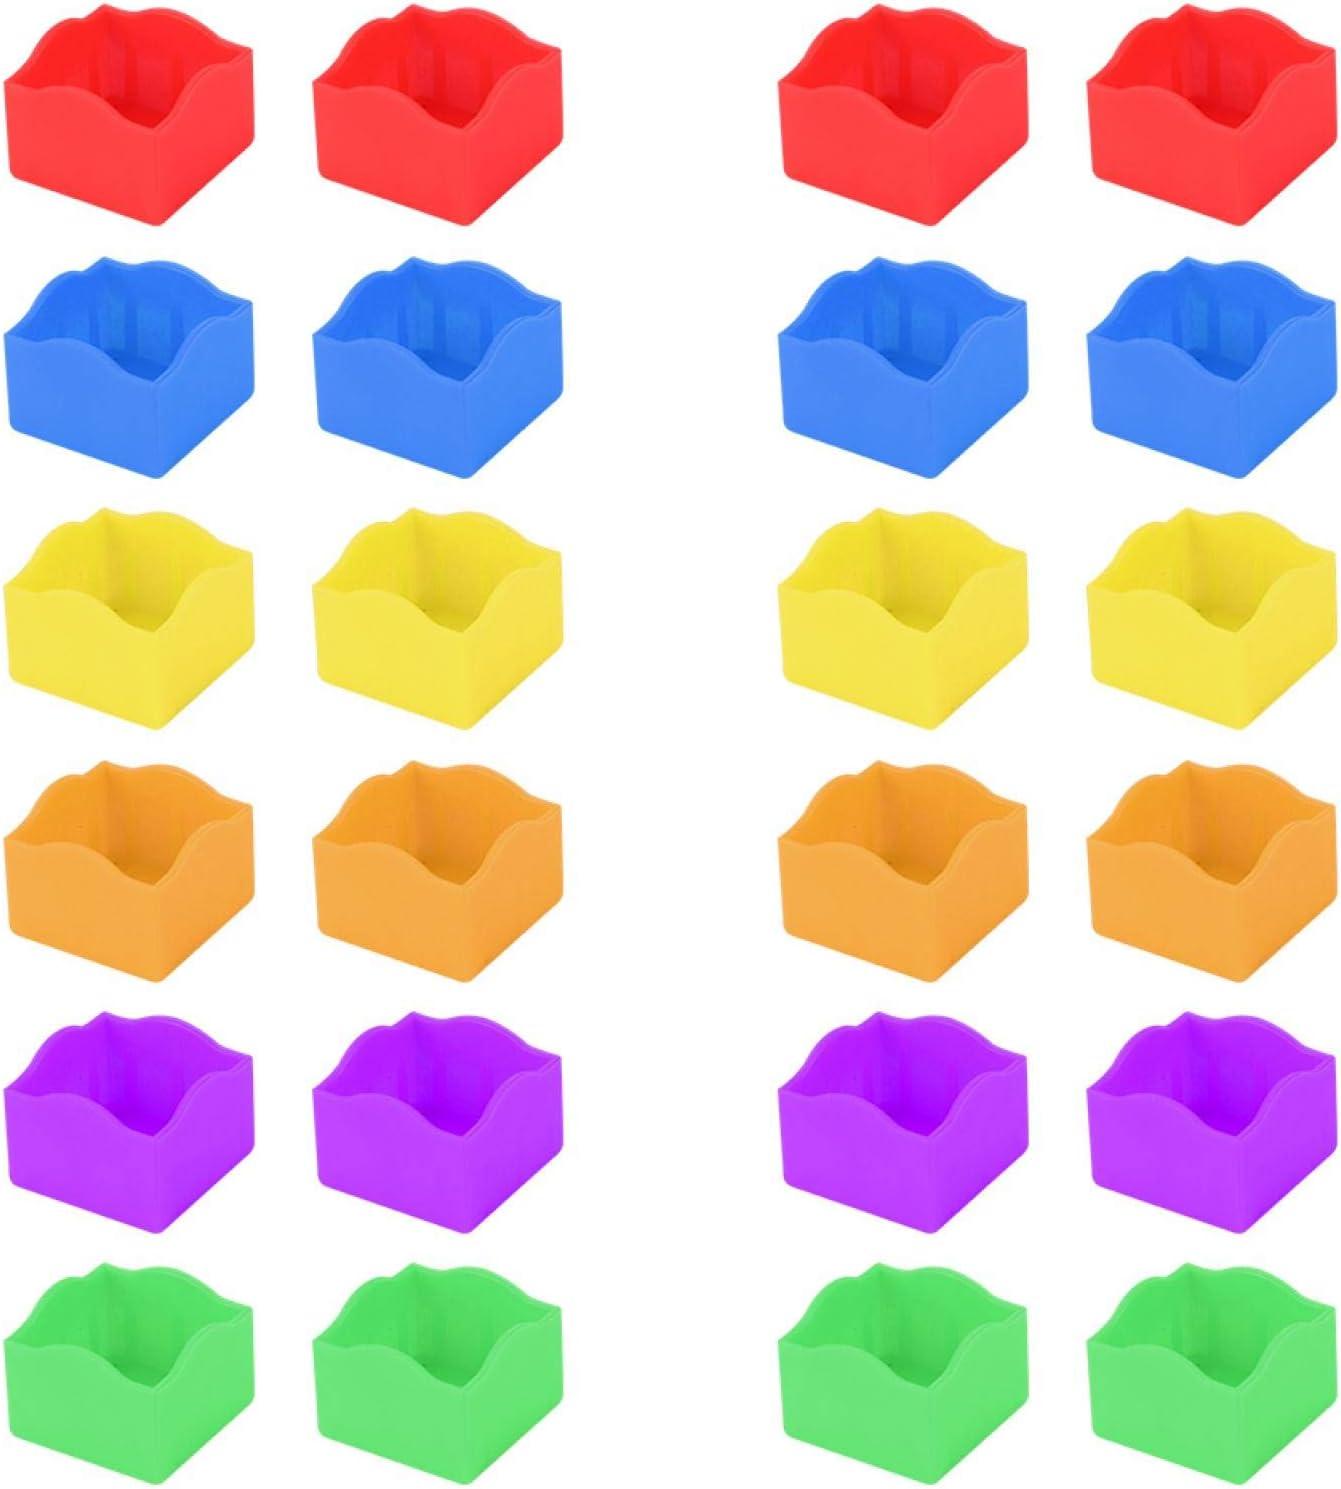 Moh Billiard Chalk Holder 24PCS Ranking TOP3 SALENEW very popular! Portable Bil Multi-Color Plastic